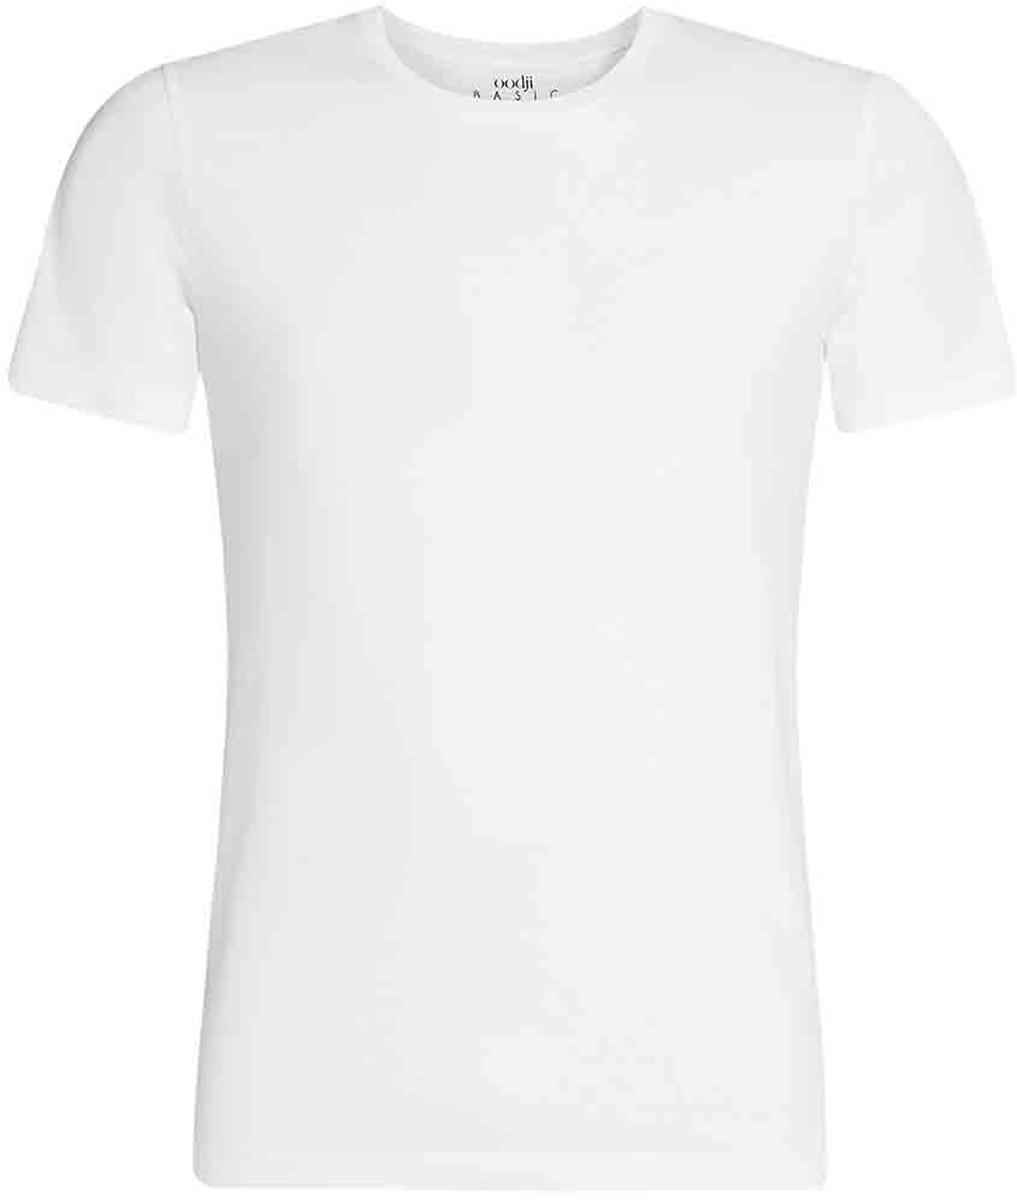 Футболка мужская oodji Basic, цвет: белый. 5B611003M/44135N/1000N. Размер XXL (58/60)5B611003M/44135N/1000NКомфортная мужская футболка от oodji с короткими рукавами и круглым вырезом горловины выполнена из натурального хлопка.